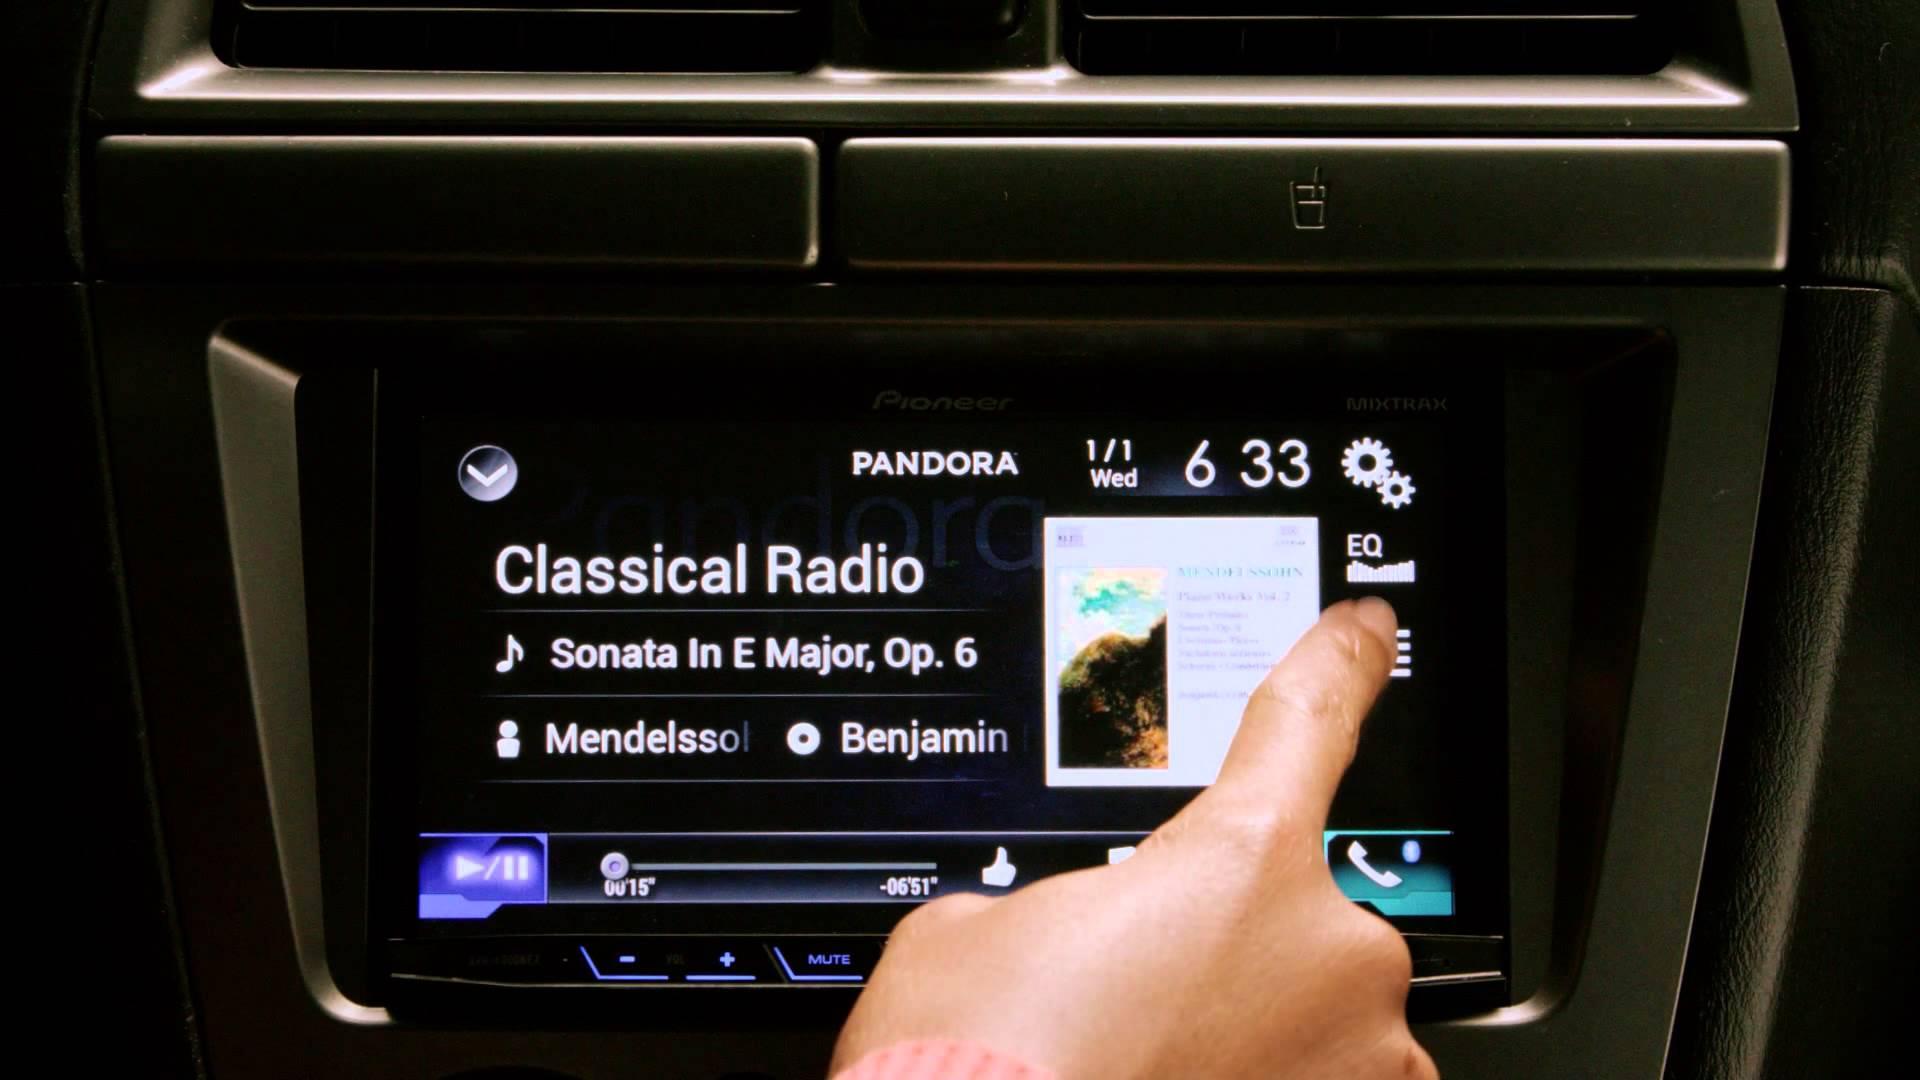 Pandora's app on a car dashboard.